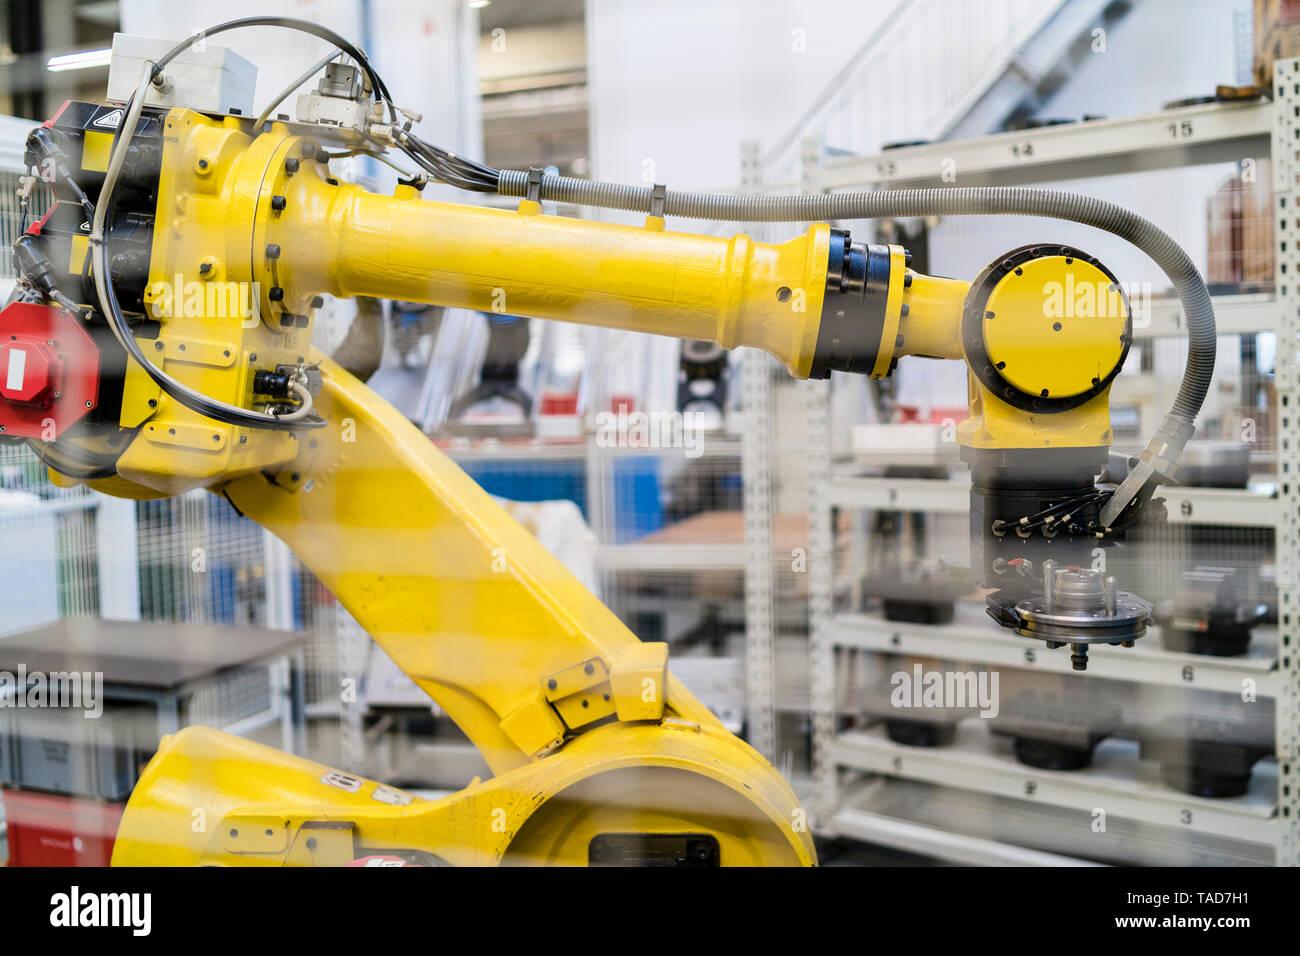 Robot industriel dans l'usine moderne Banque D'Images